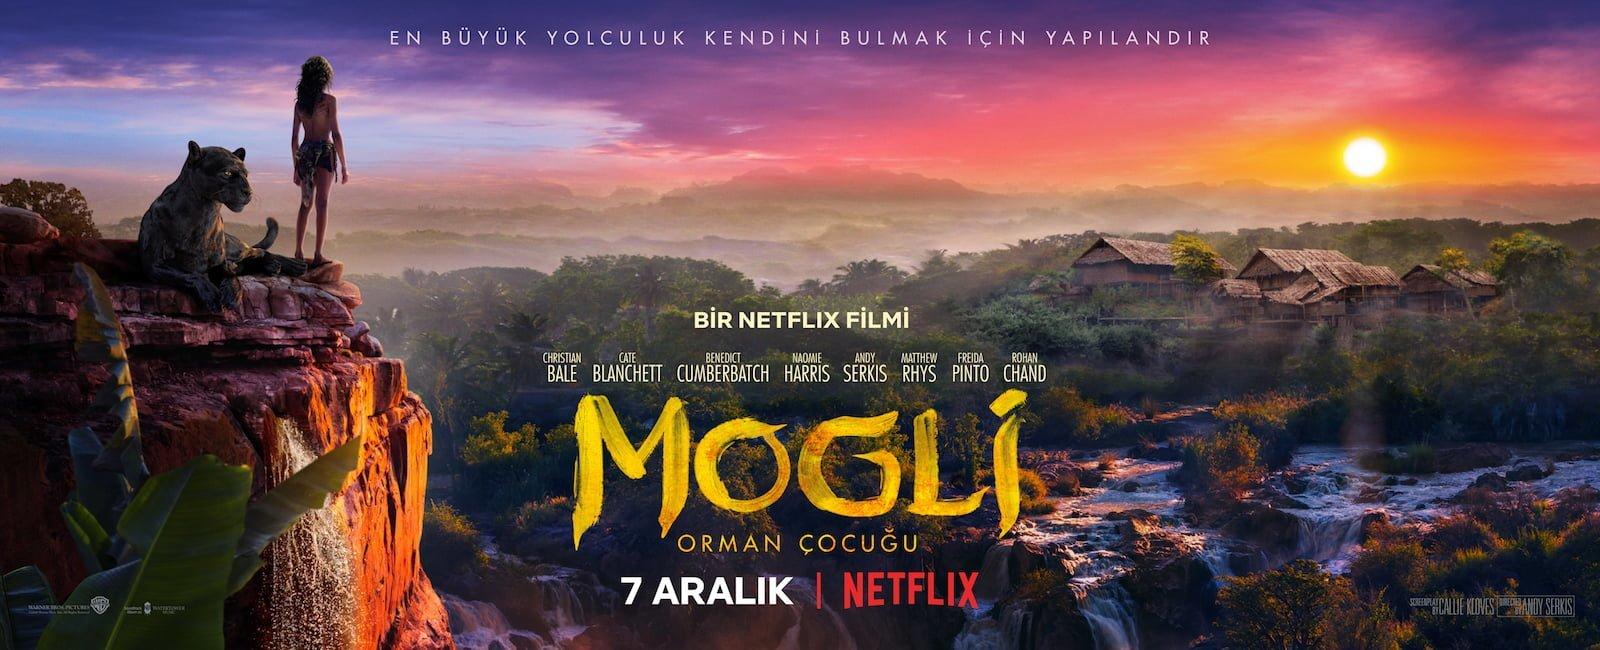 Netflix'ten Dev Kadrolu Bir Yapım: Mogli: Orman Çocuğu